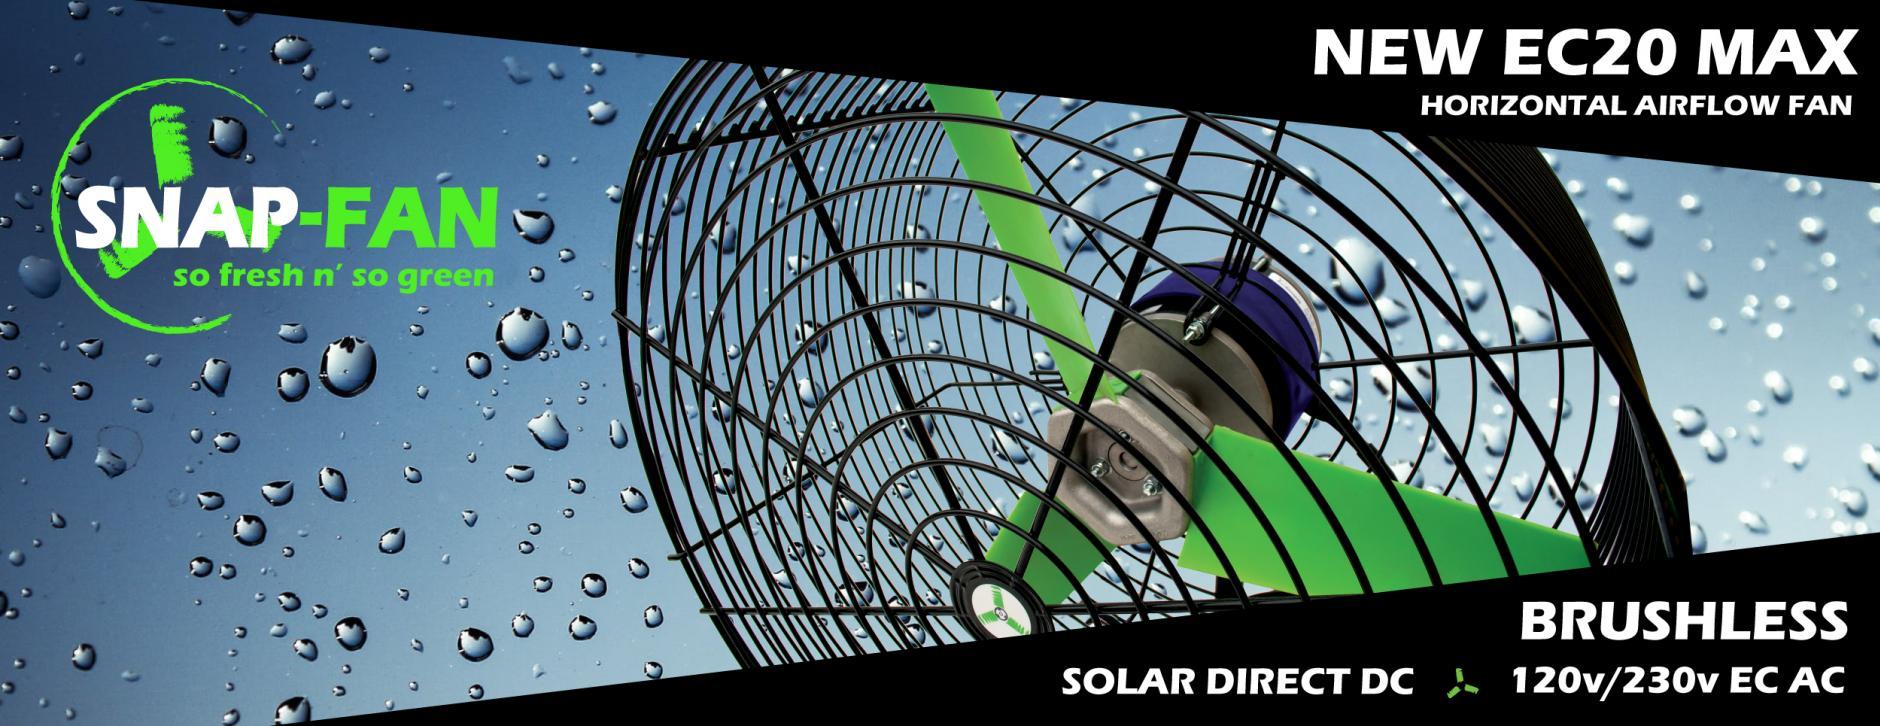 Brushless efficient energy saving grow fan IP54